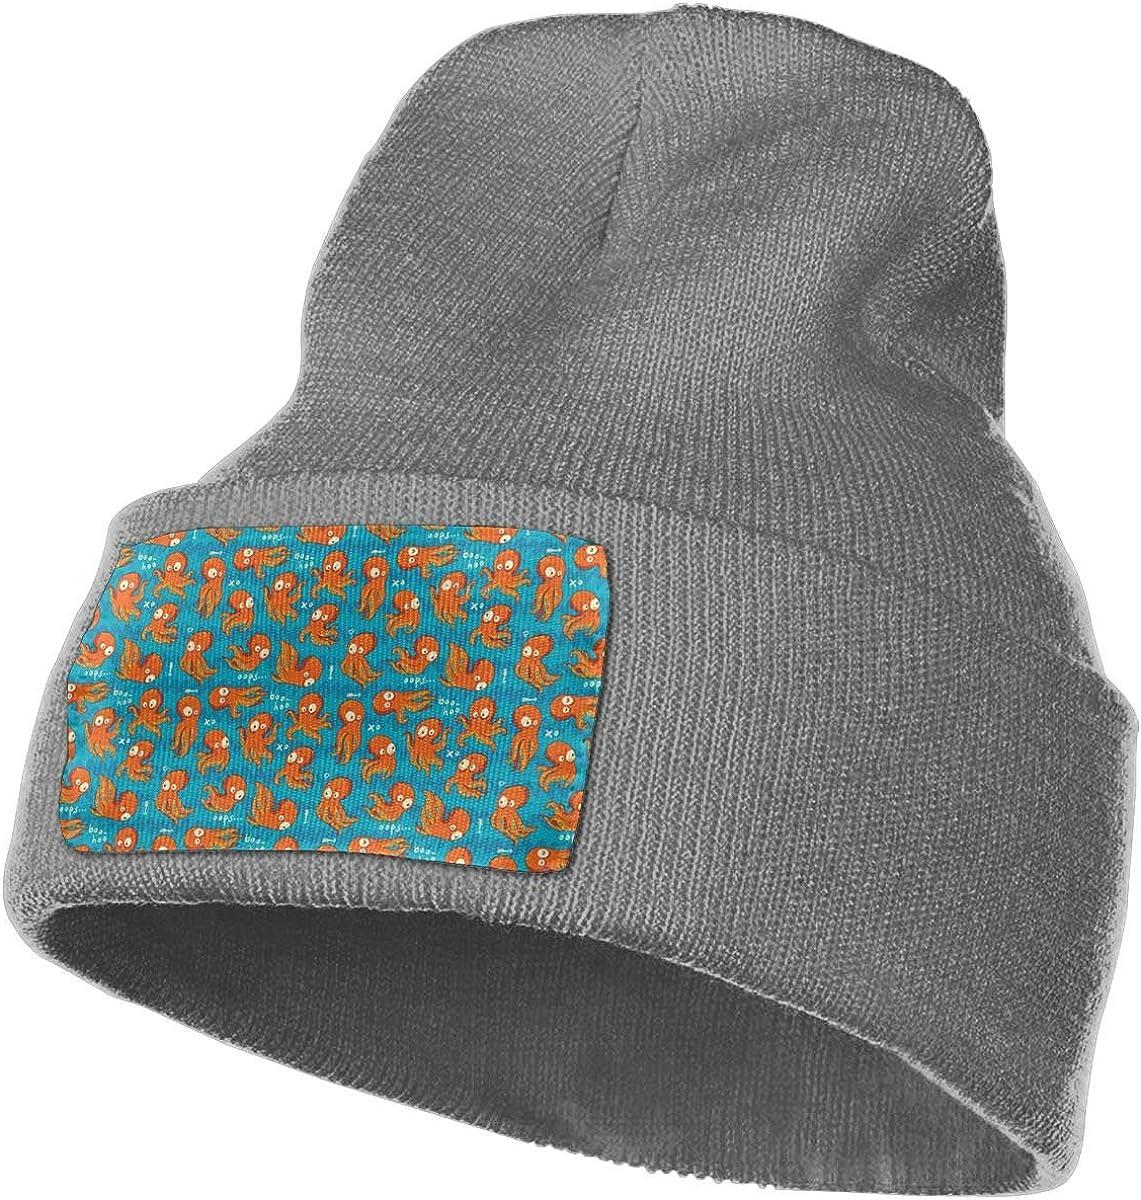 Orange Octopuses Men Women Soft Warm Knitting Beanie Hat Skull Serious Style Hats